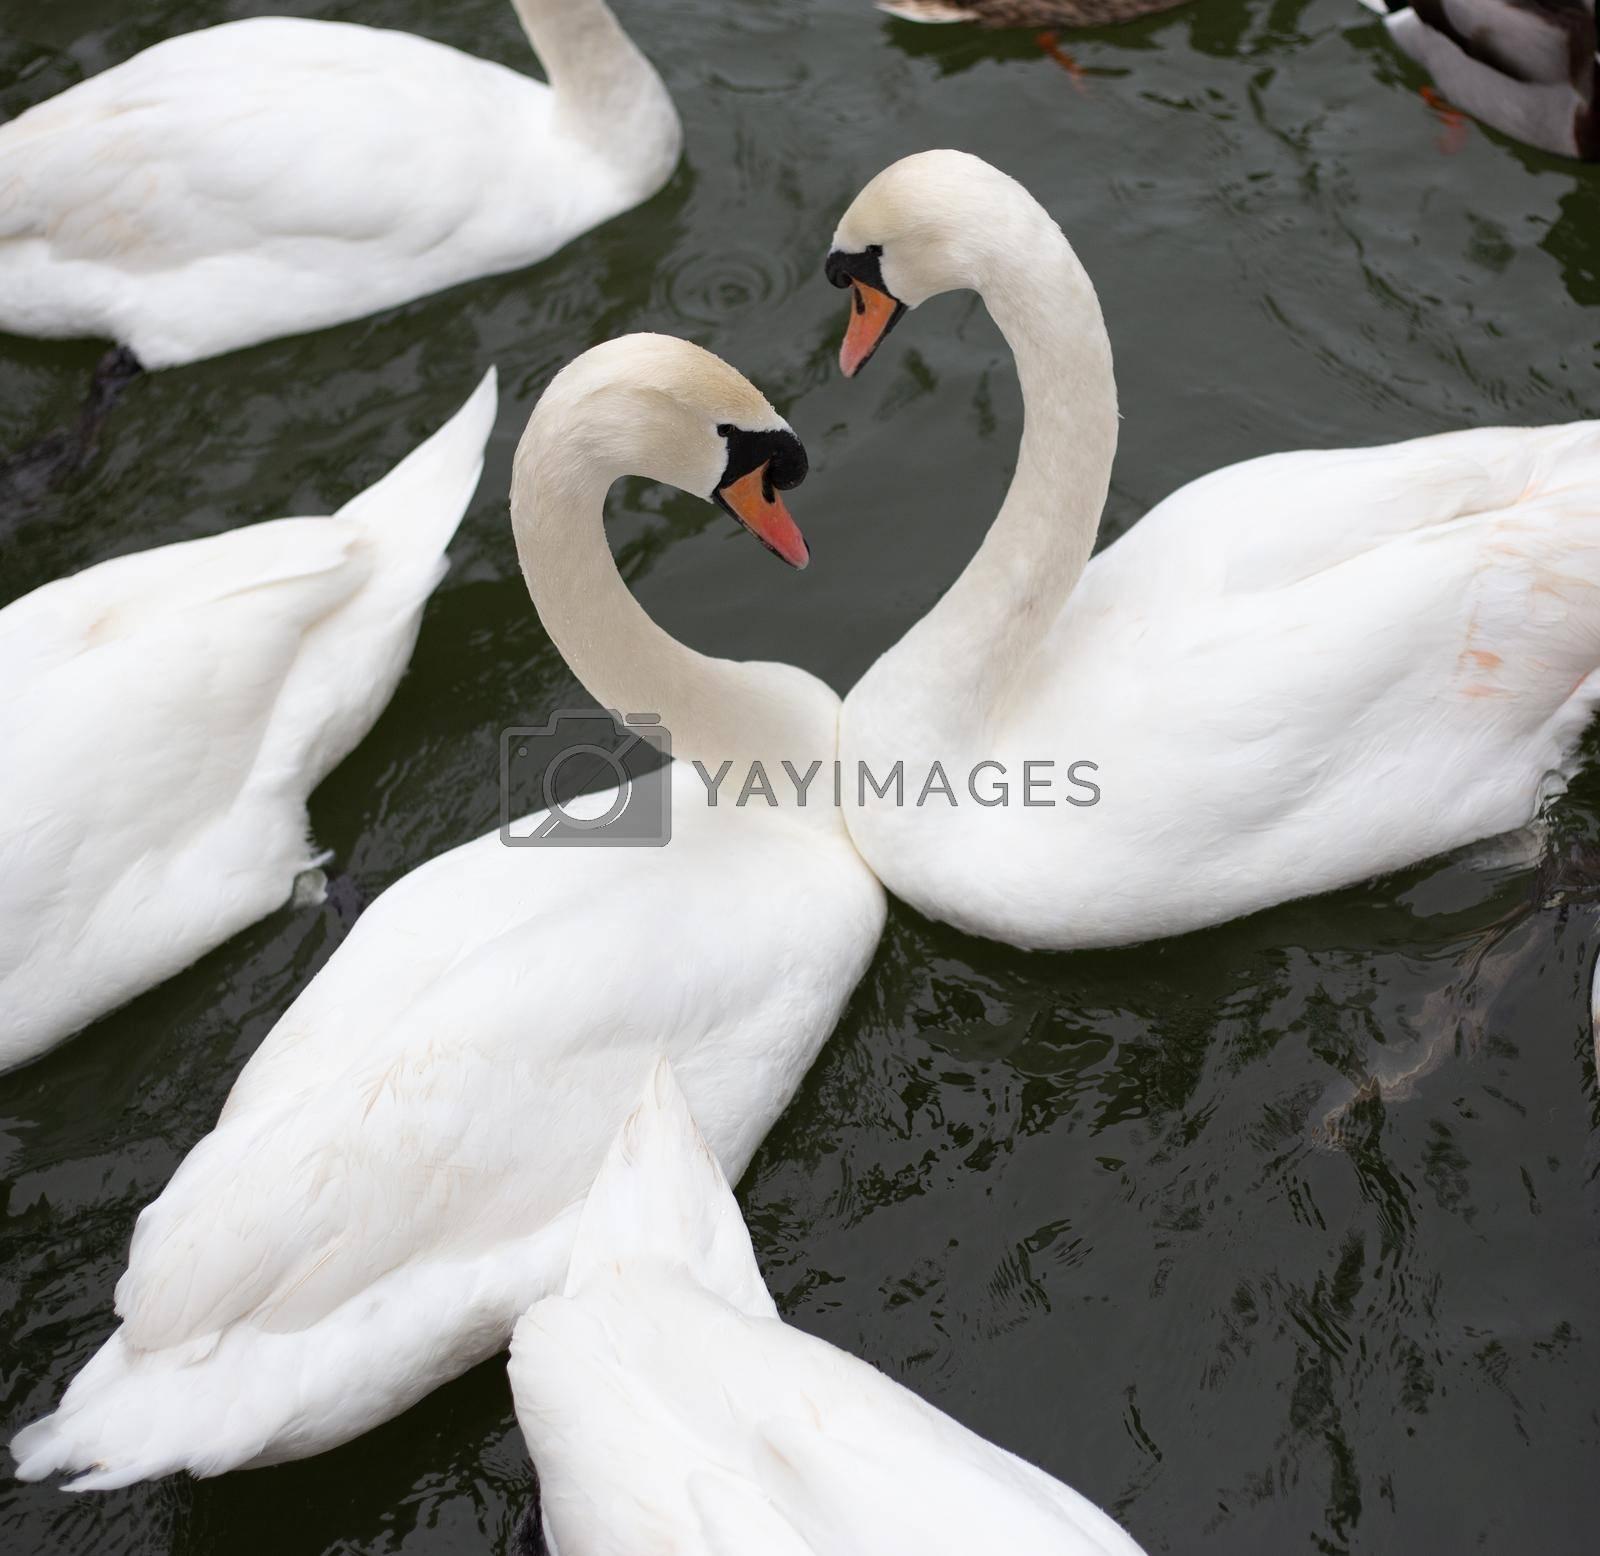 White swans in water by NelliPolk